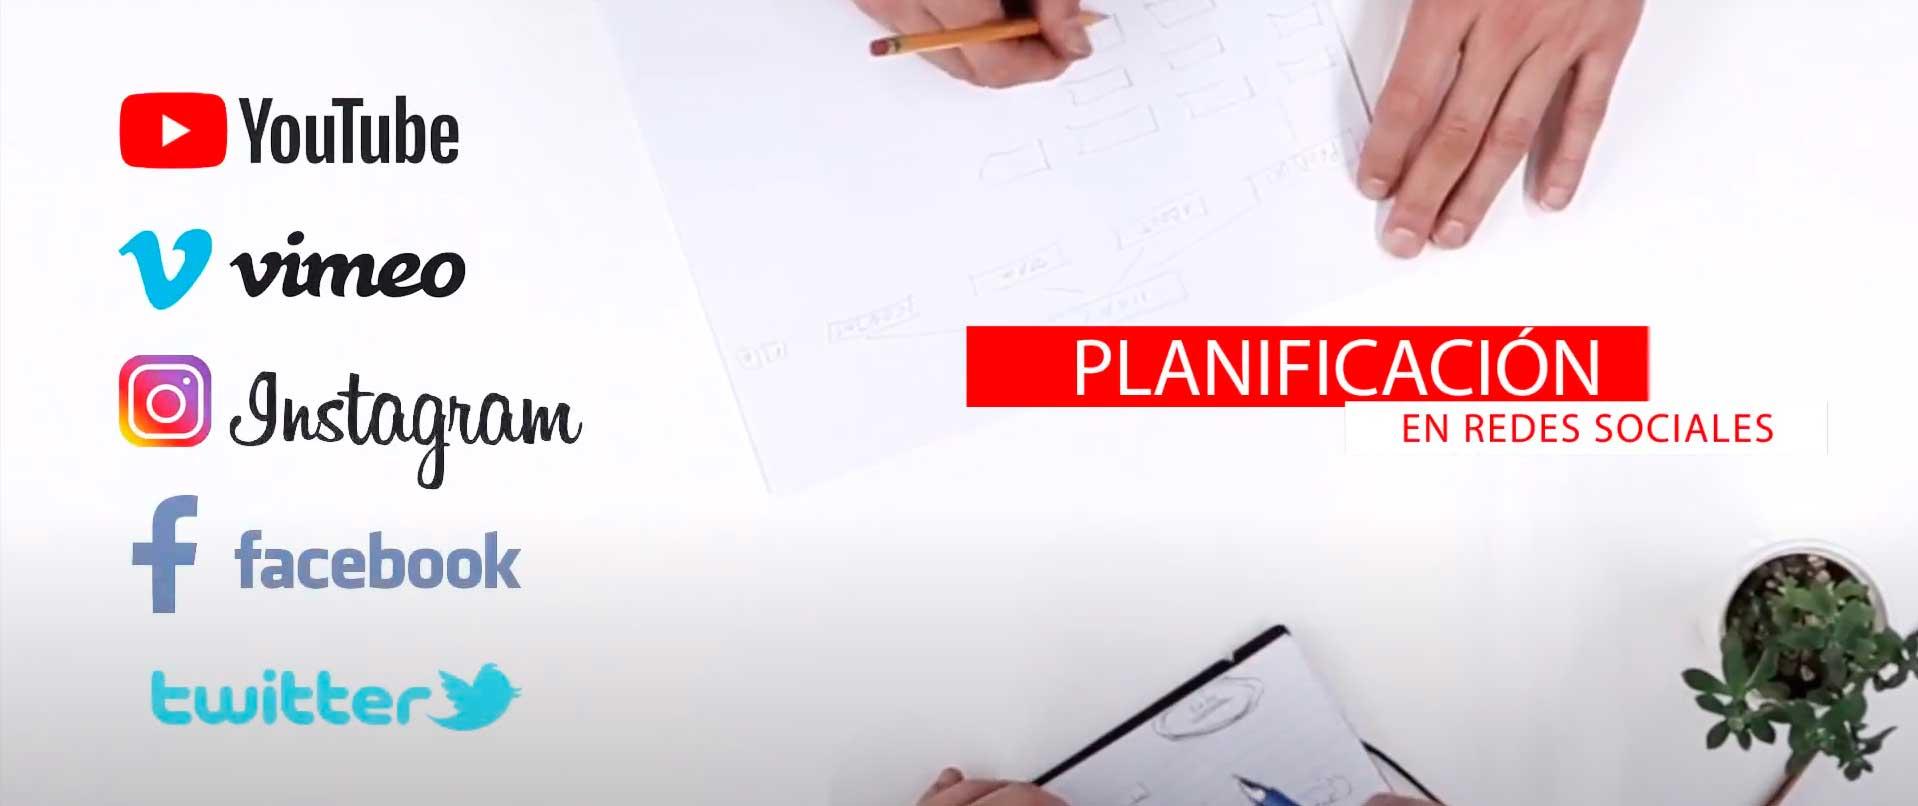 Videomarketing-para-empresas-planificacion